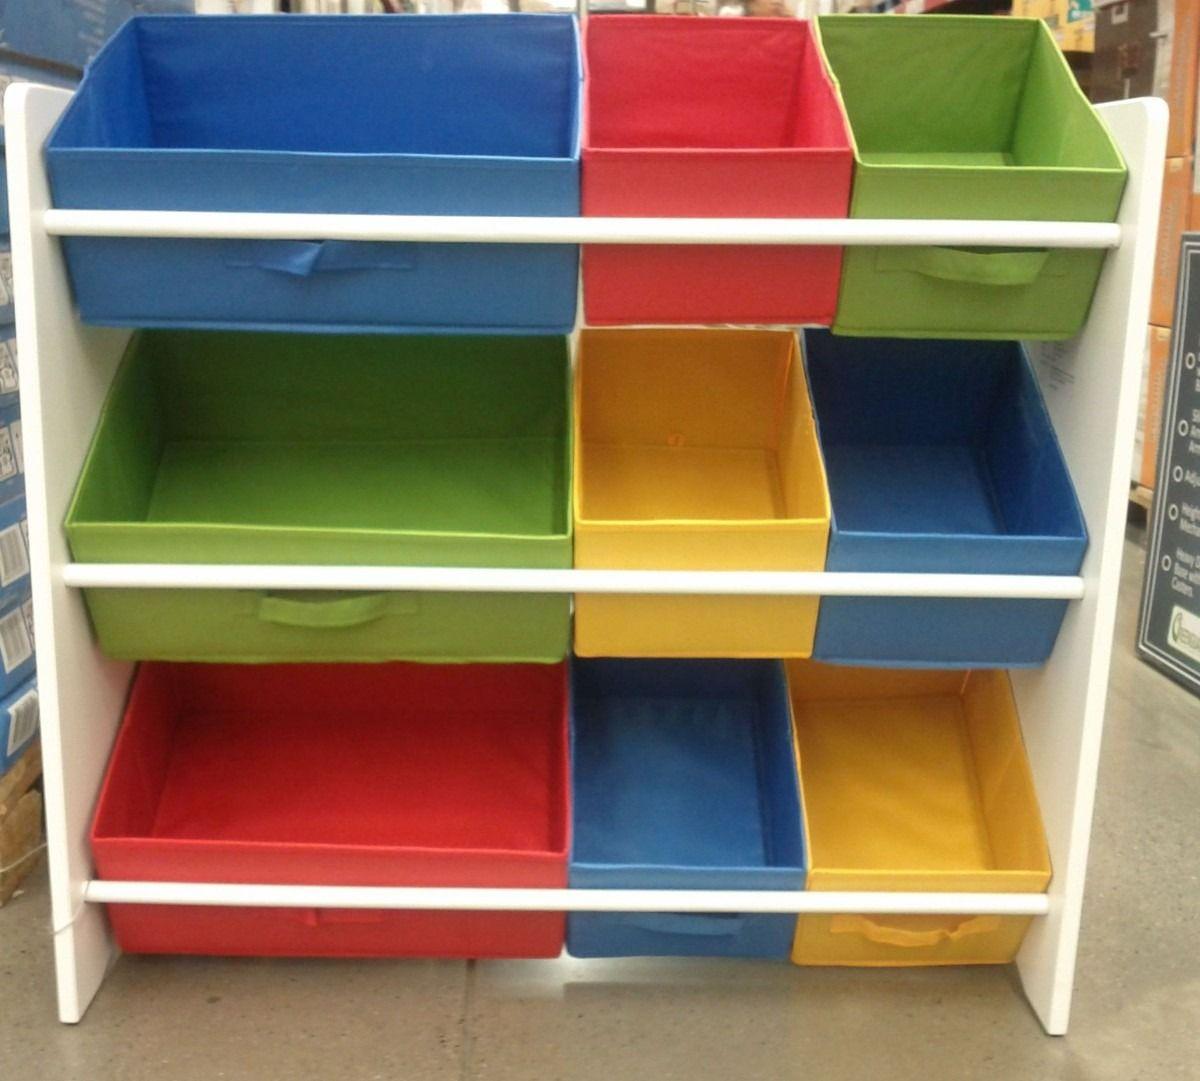 Organizador infantil caixas para brinquedos estante - Organizadores de armario ...